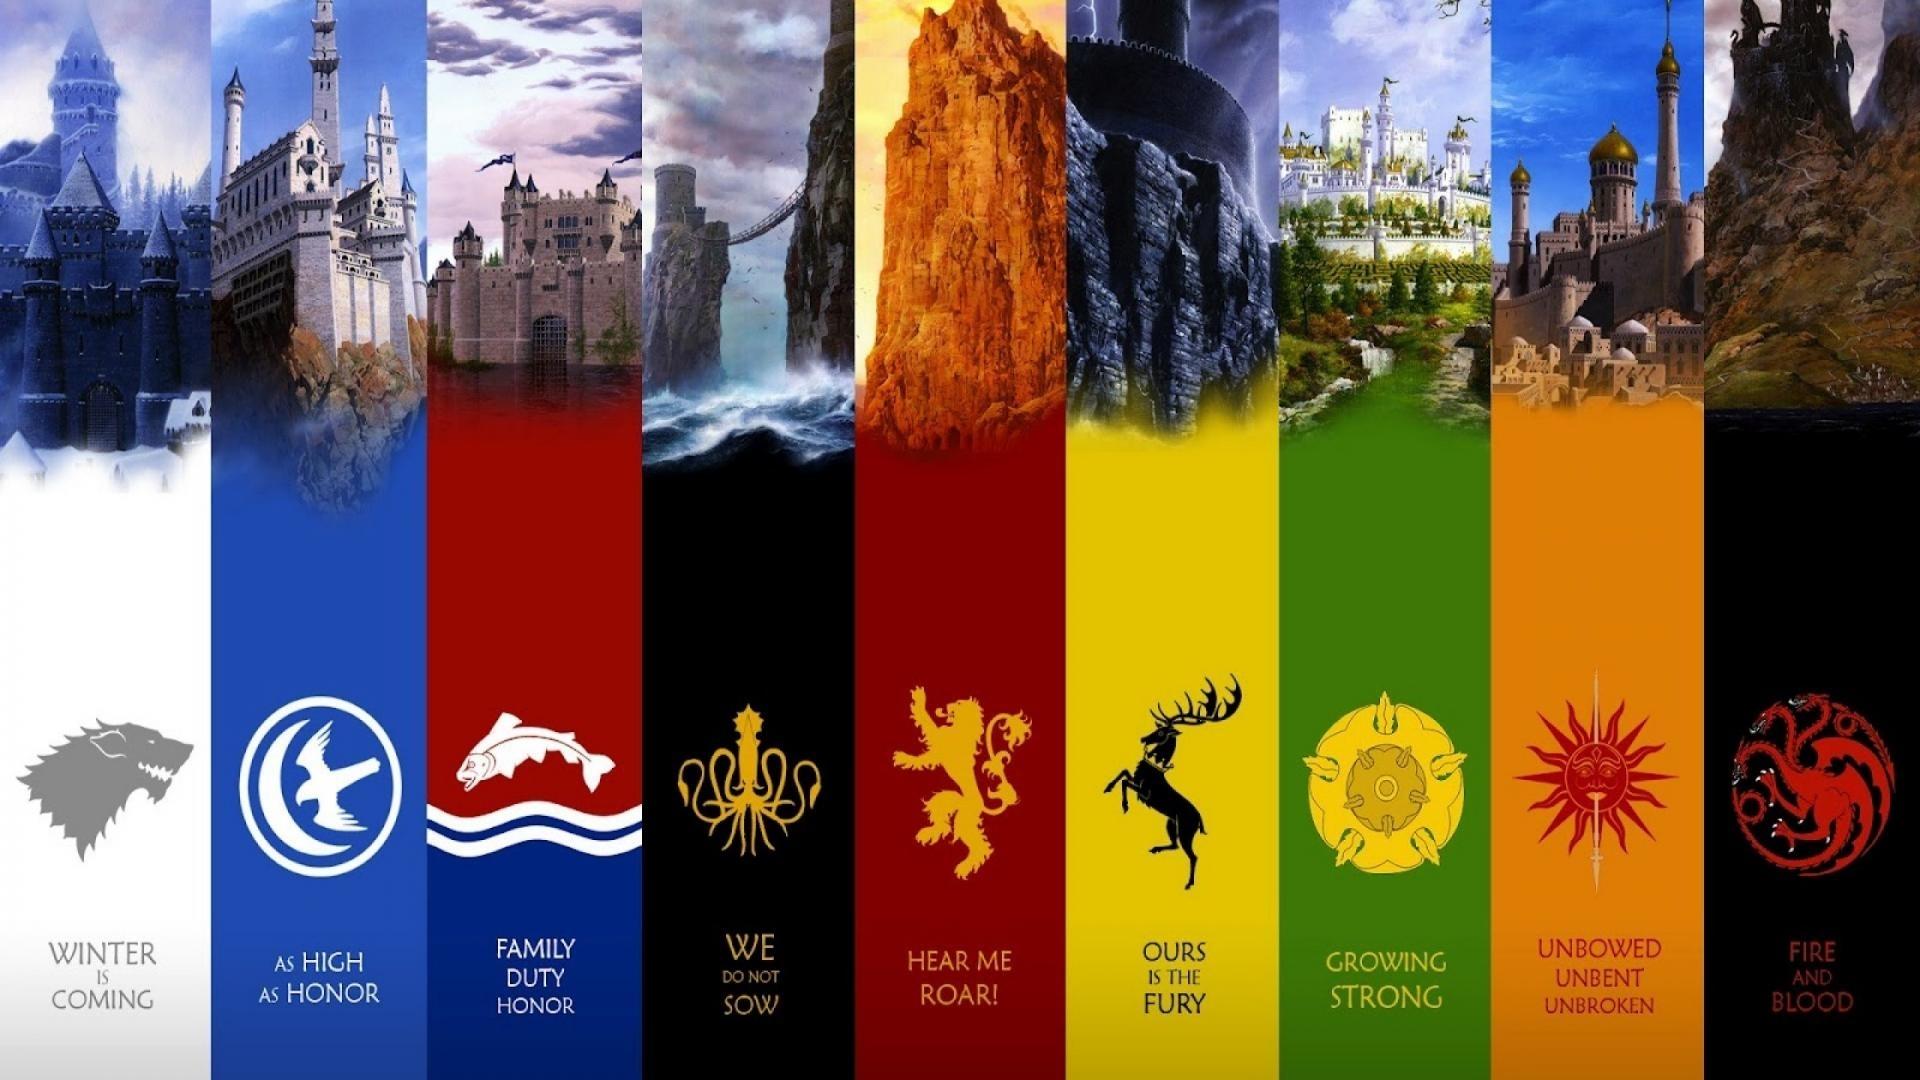 houses game of thrones logos tv series wallpaper   (103972)